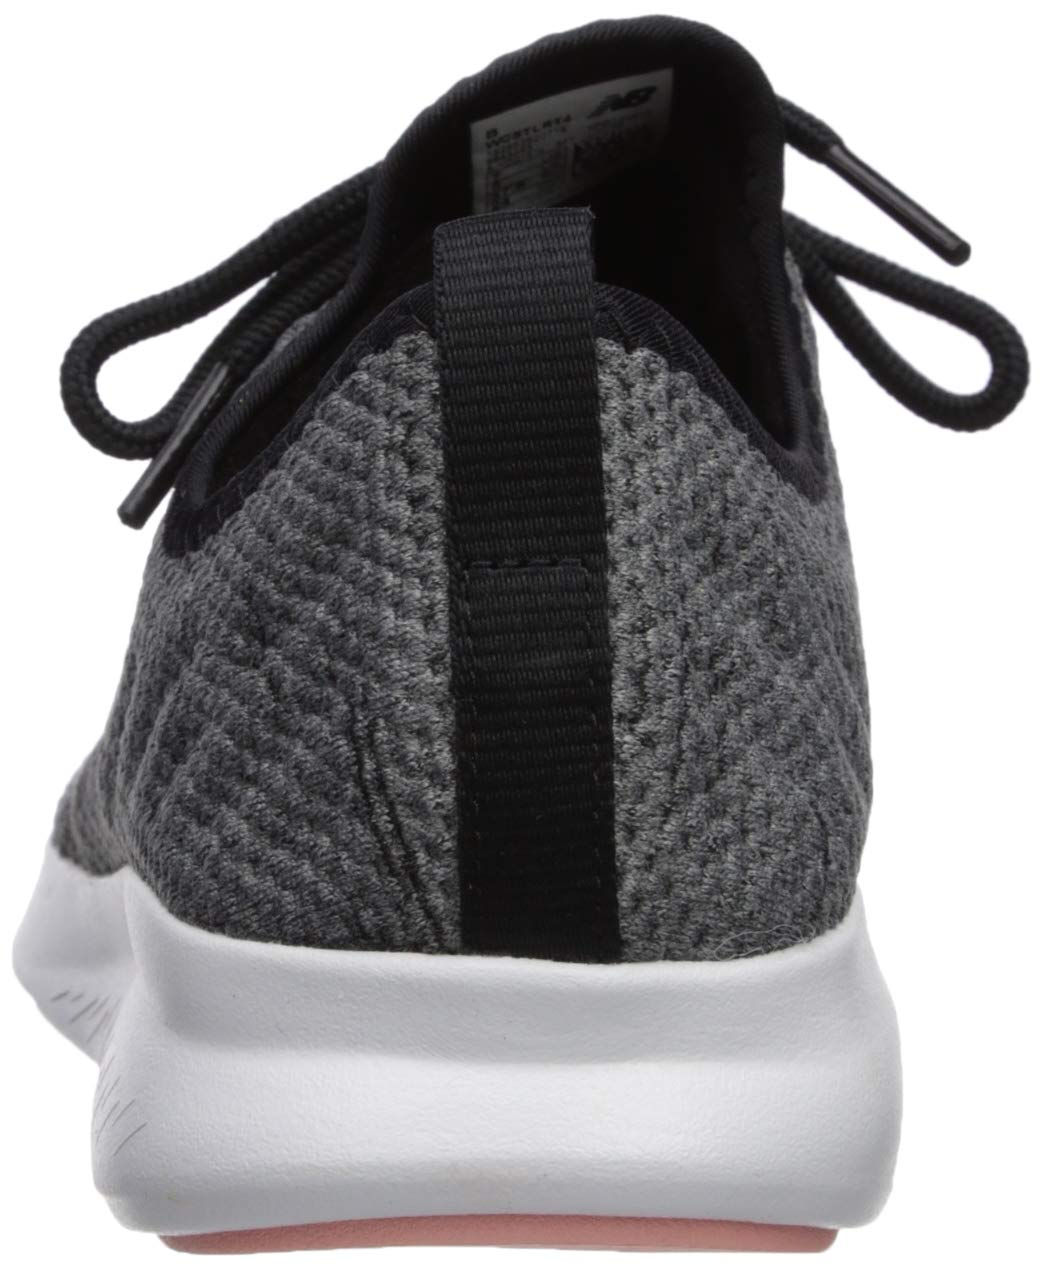 61CwyN9VVDL - New Balance Women's Fuel Core Coast V4 Running Shoes